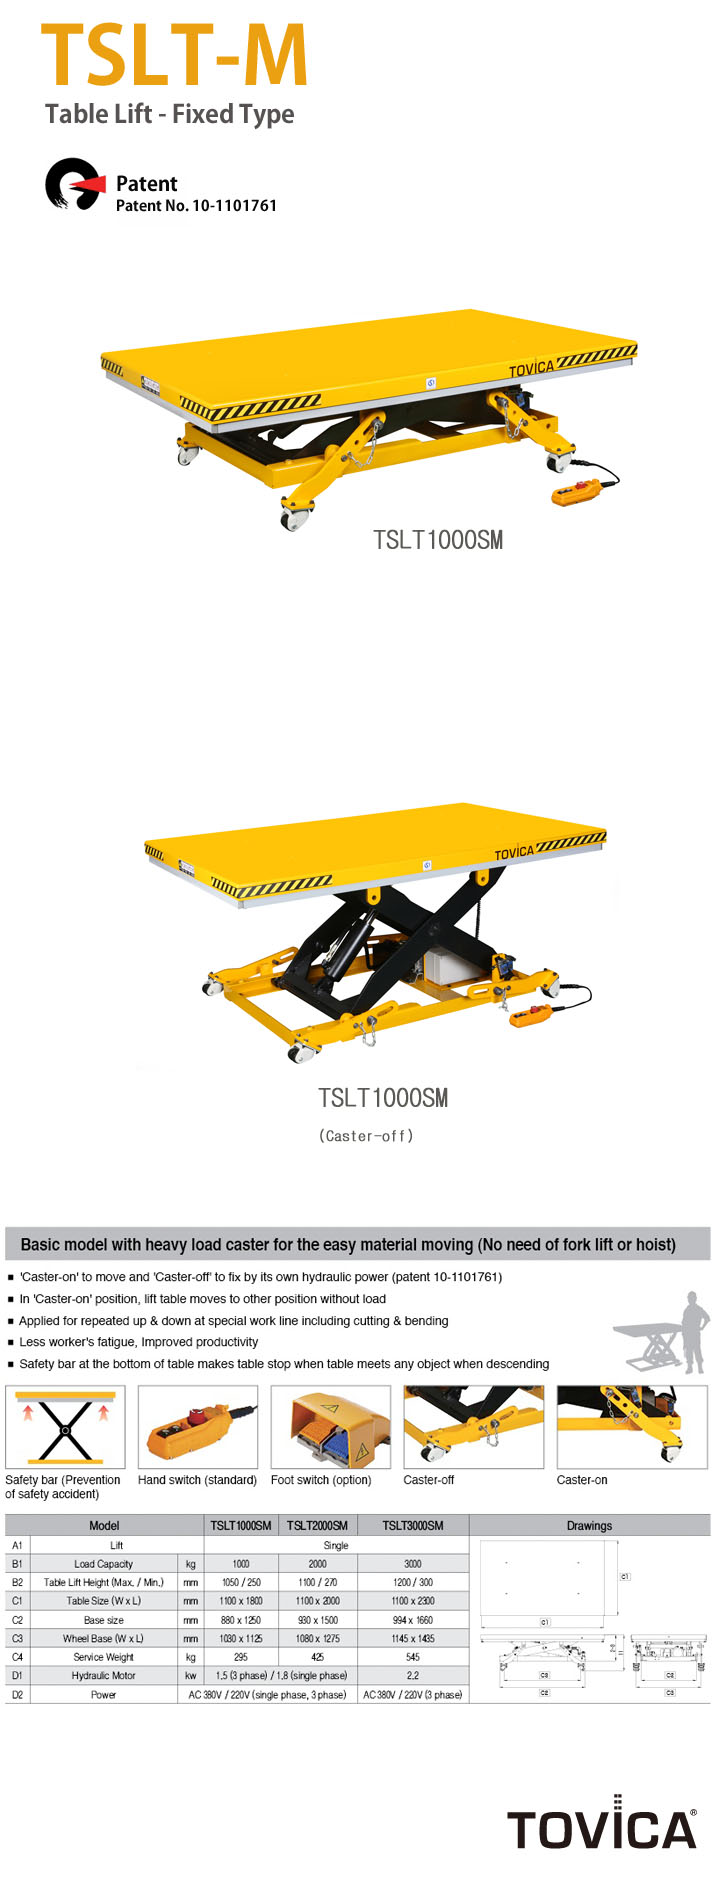 TAEJIN ENG Table Lift (Fixed Type) TSLT-M